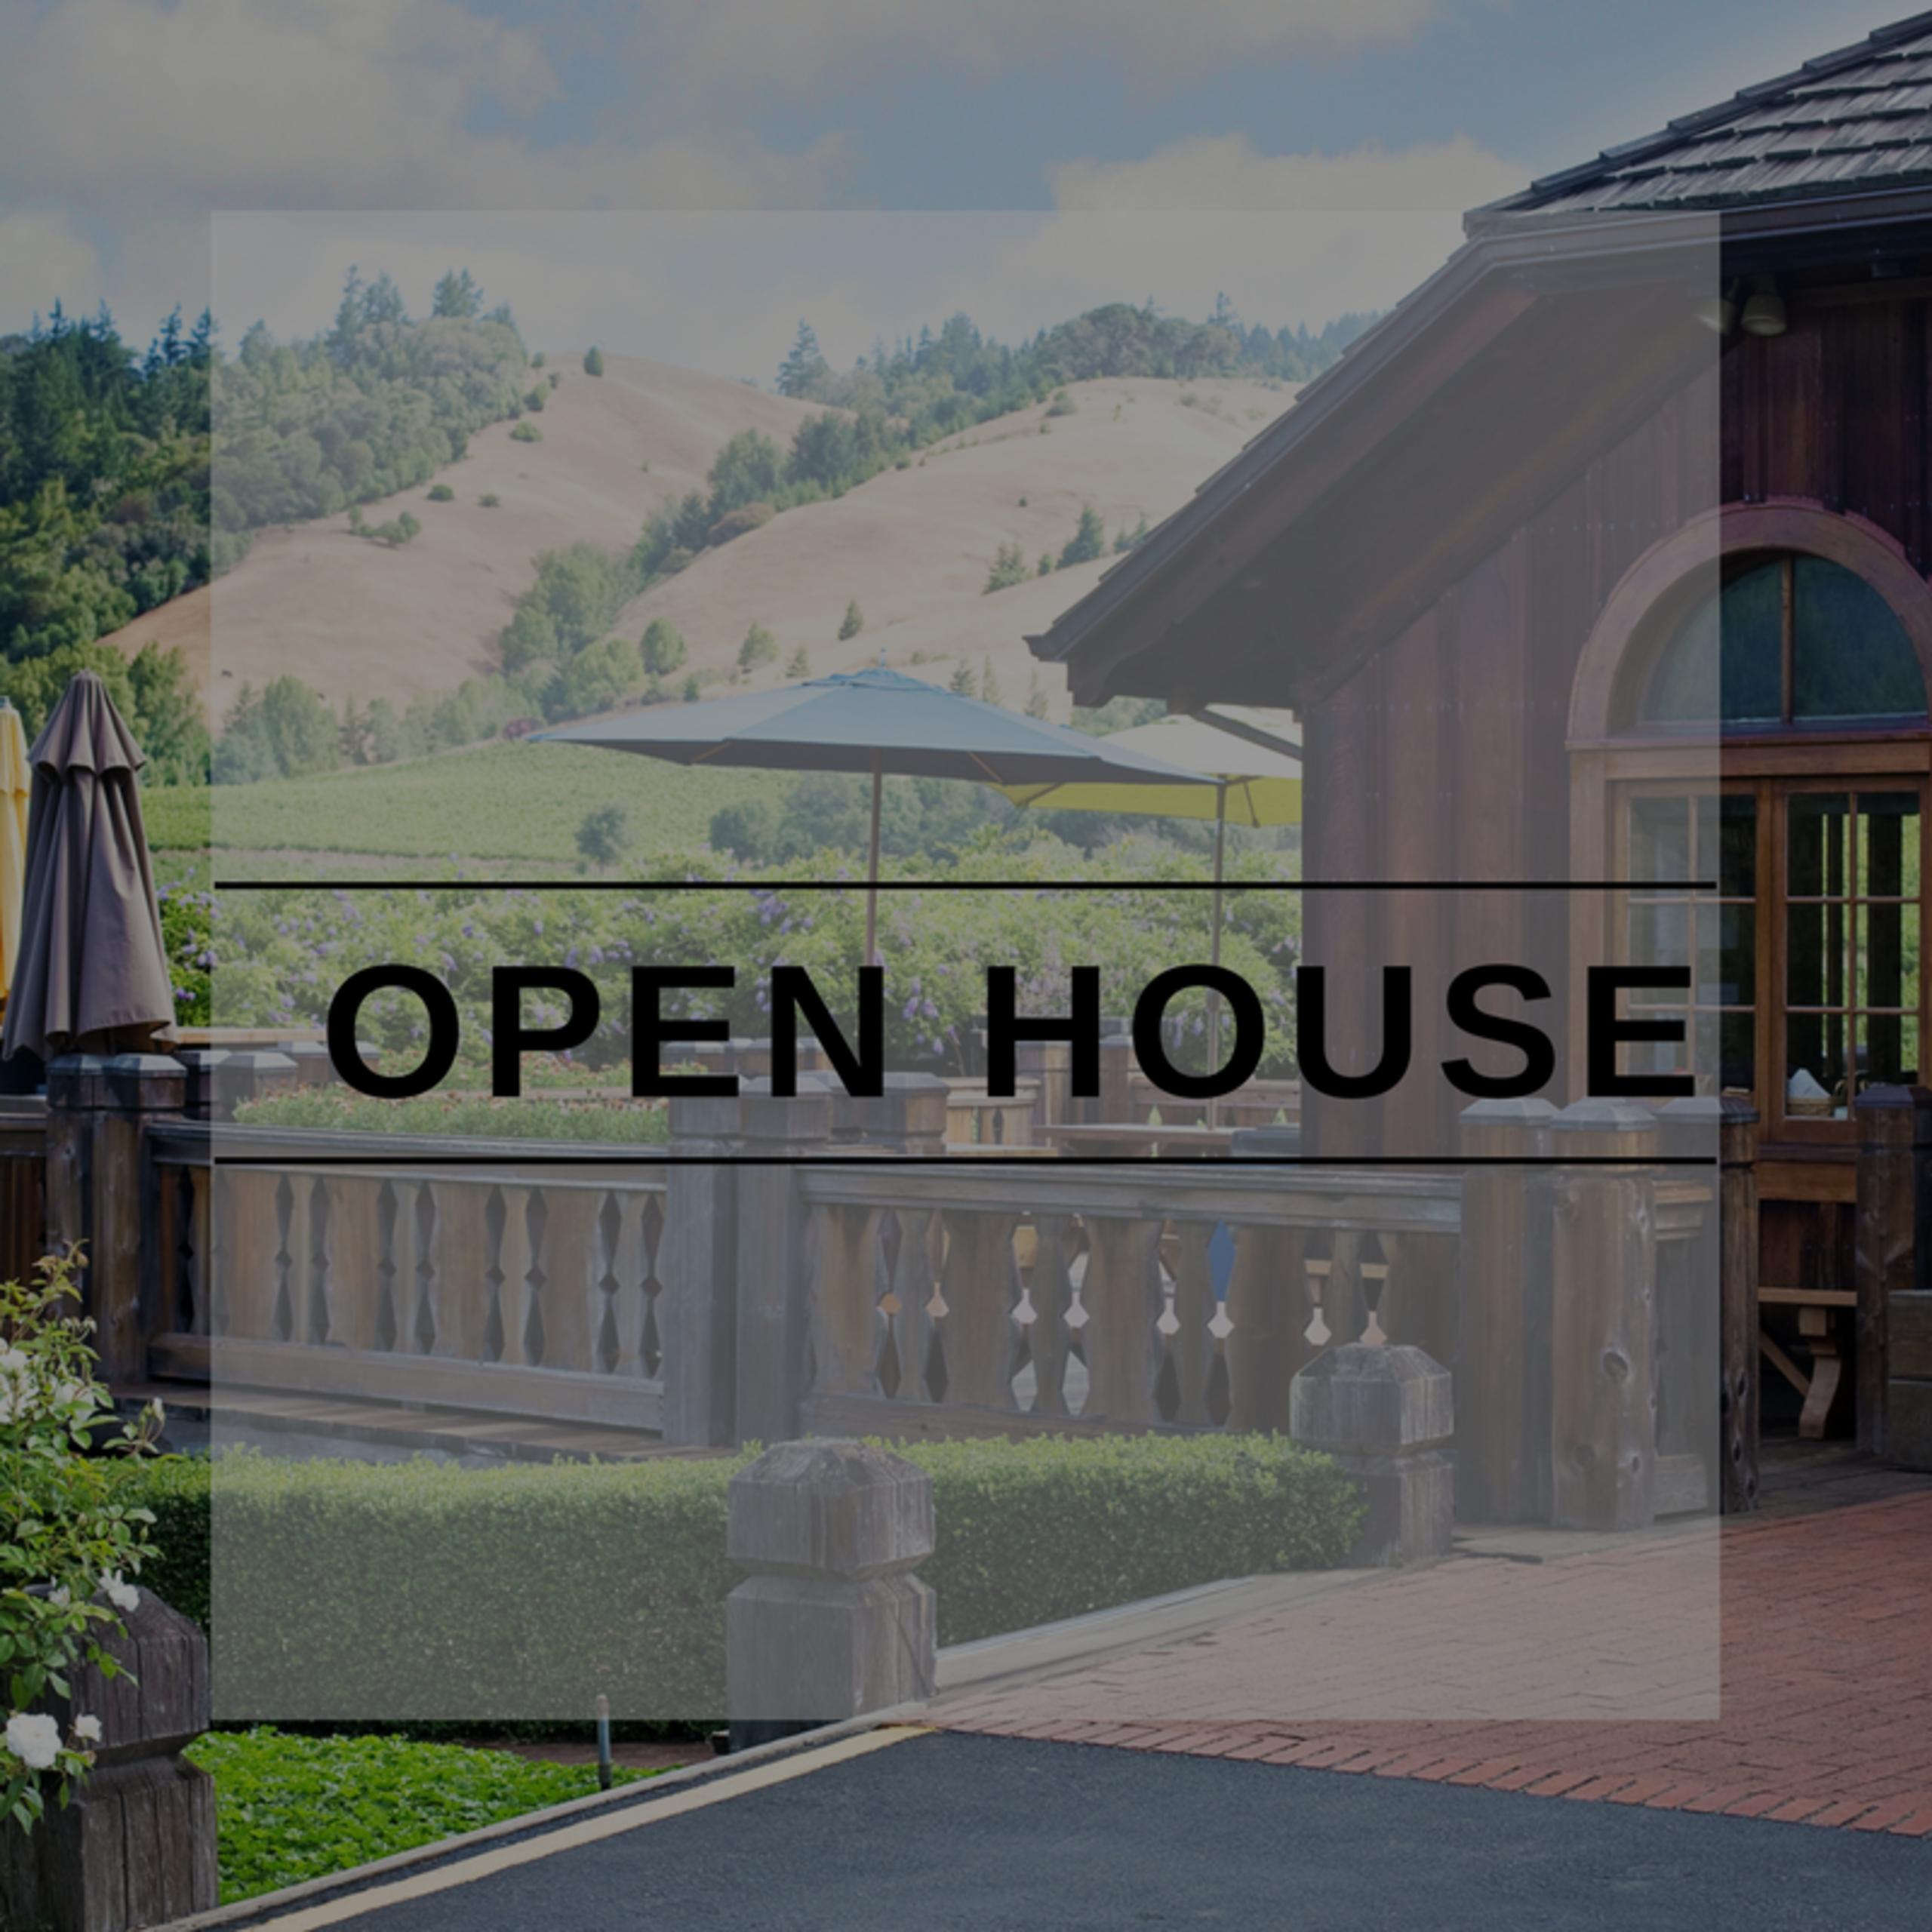 OPEN HOUSE LIST 2/17/18 – 2/18/18